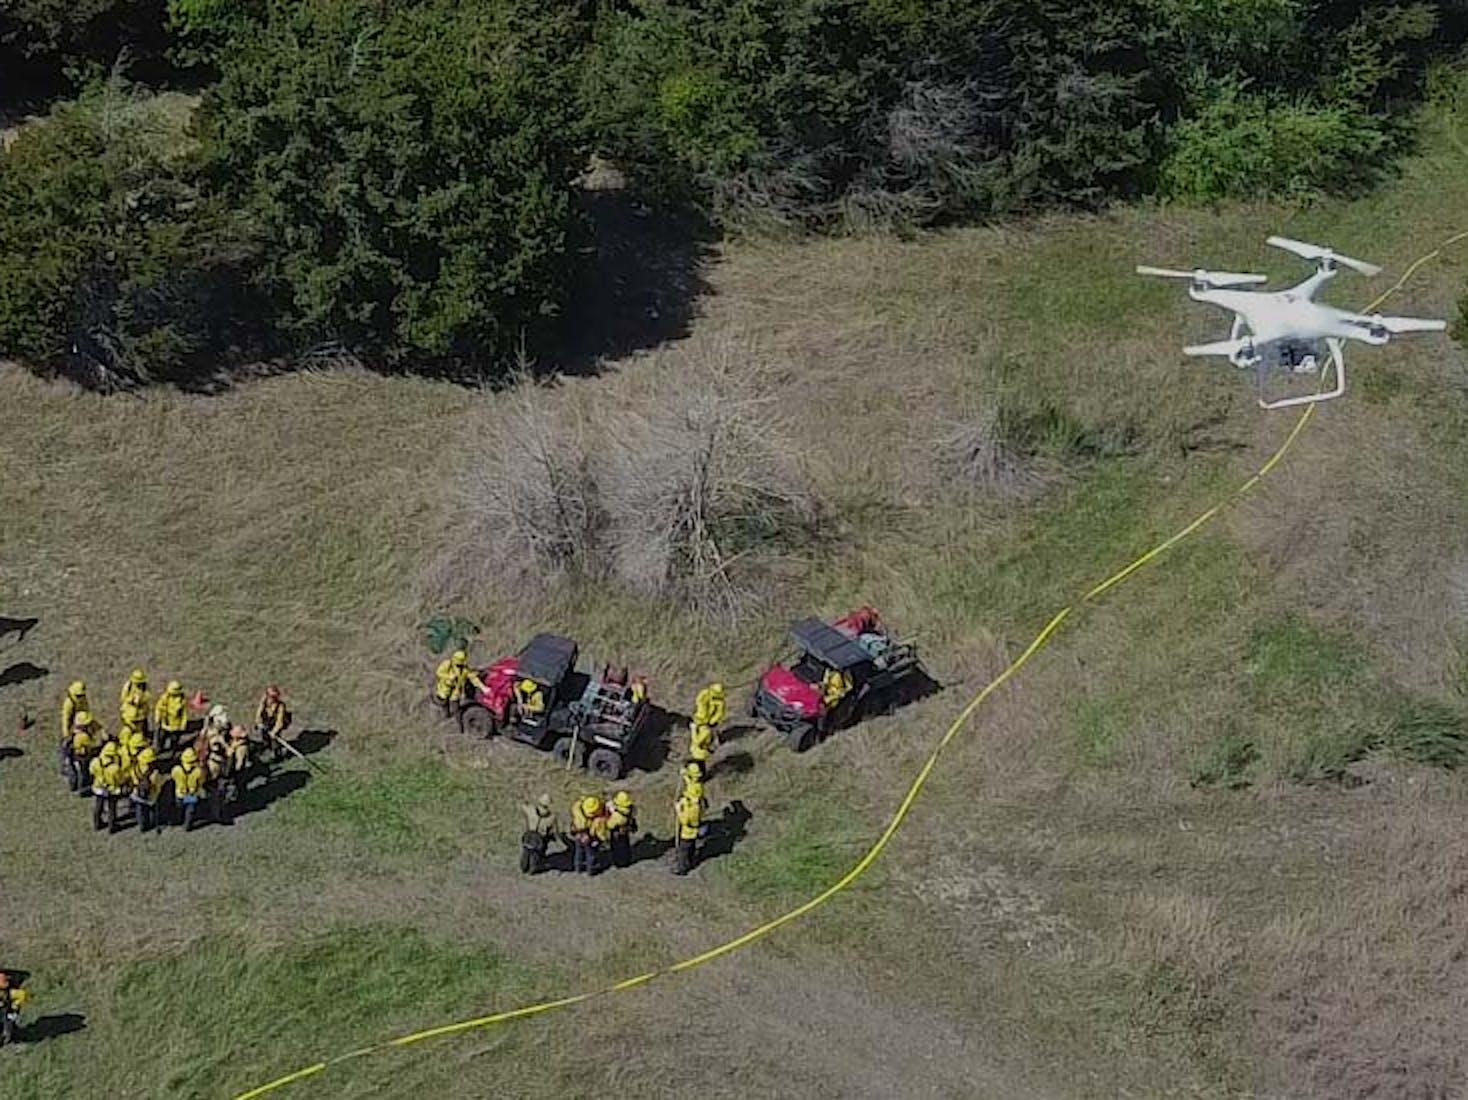 DroneSense in Action